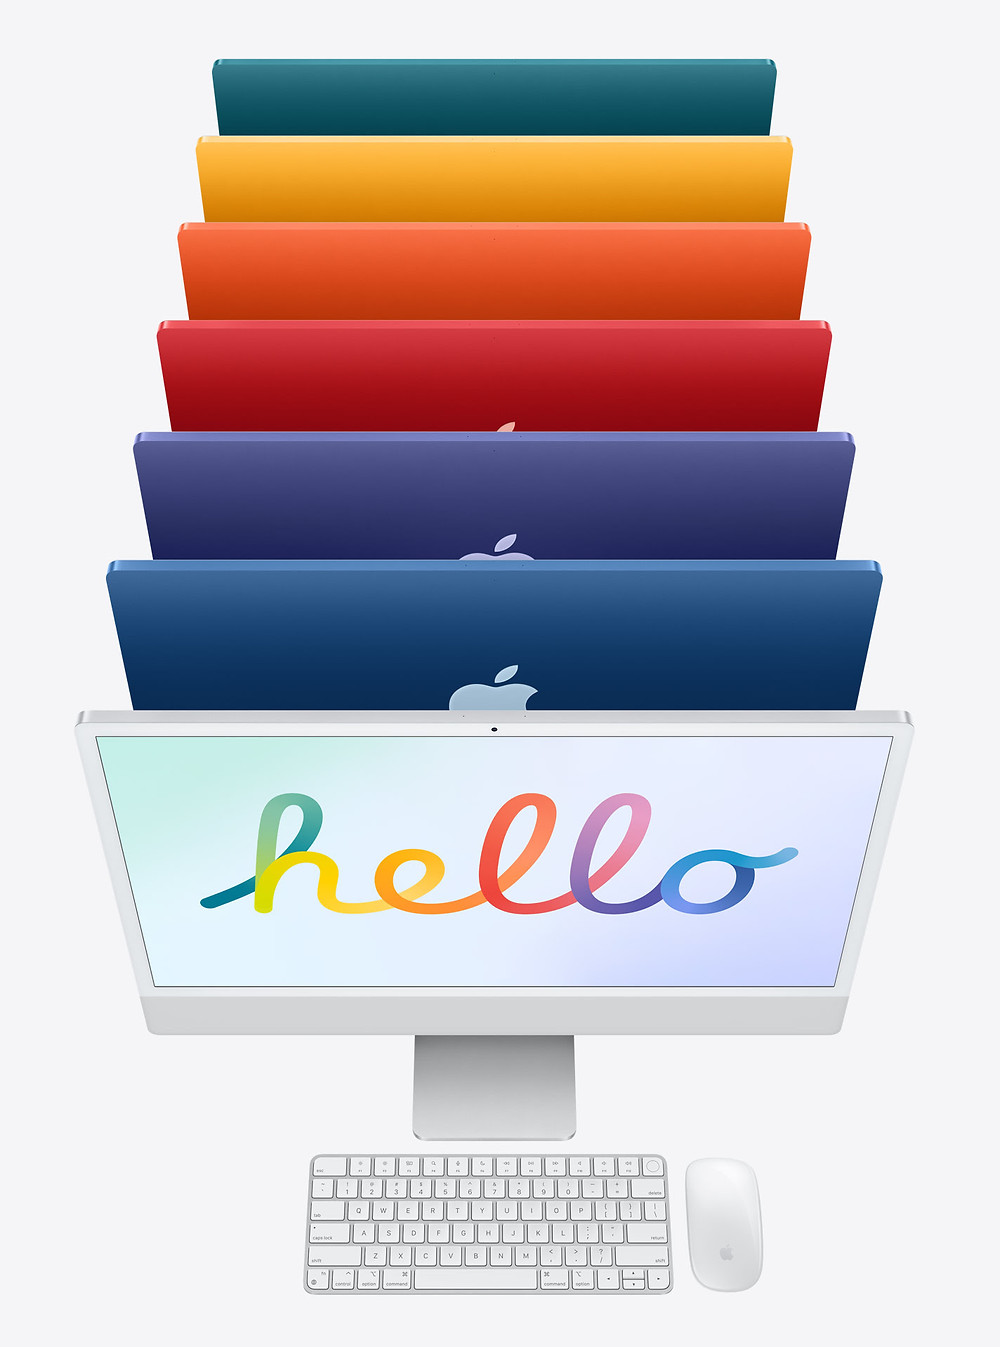 iMac Apple Computer